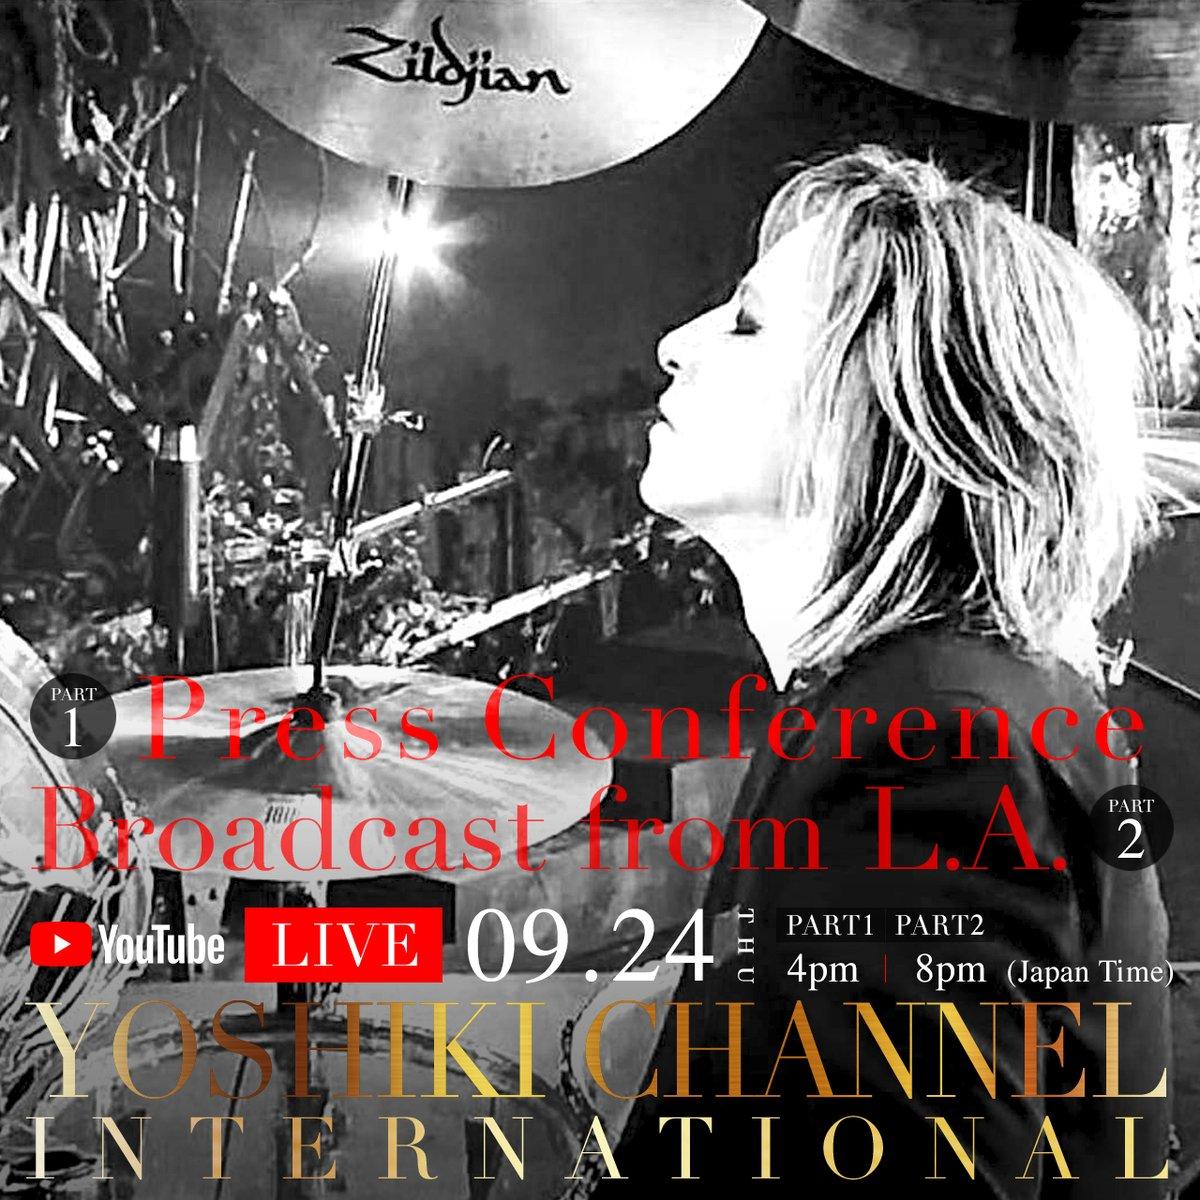 See you very soon!  #記者会見 も生放送。!RT@Yoshiki_Staff  New date! 2-Part @YoshikiChannel broadcast!Sep 24 (木)  4pm & 8pm Japan time!Part 1 記者会見生中継 16:00〜Part 2 #YOSHIKI #LA セルフ配信 20:00〜Japan International